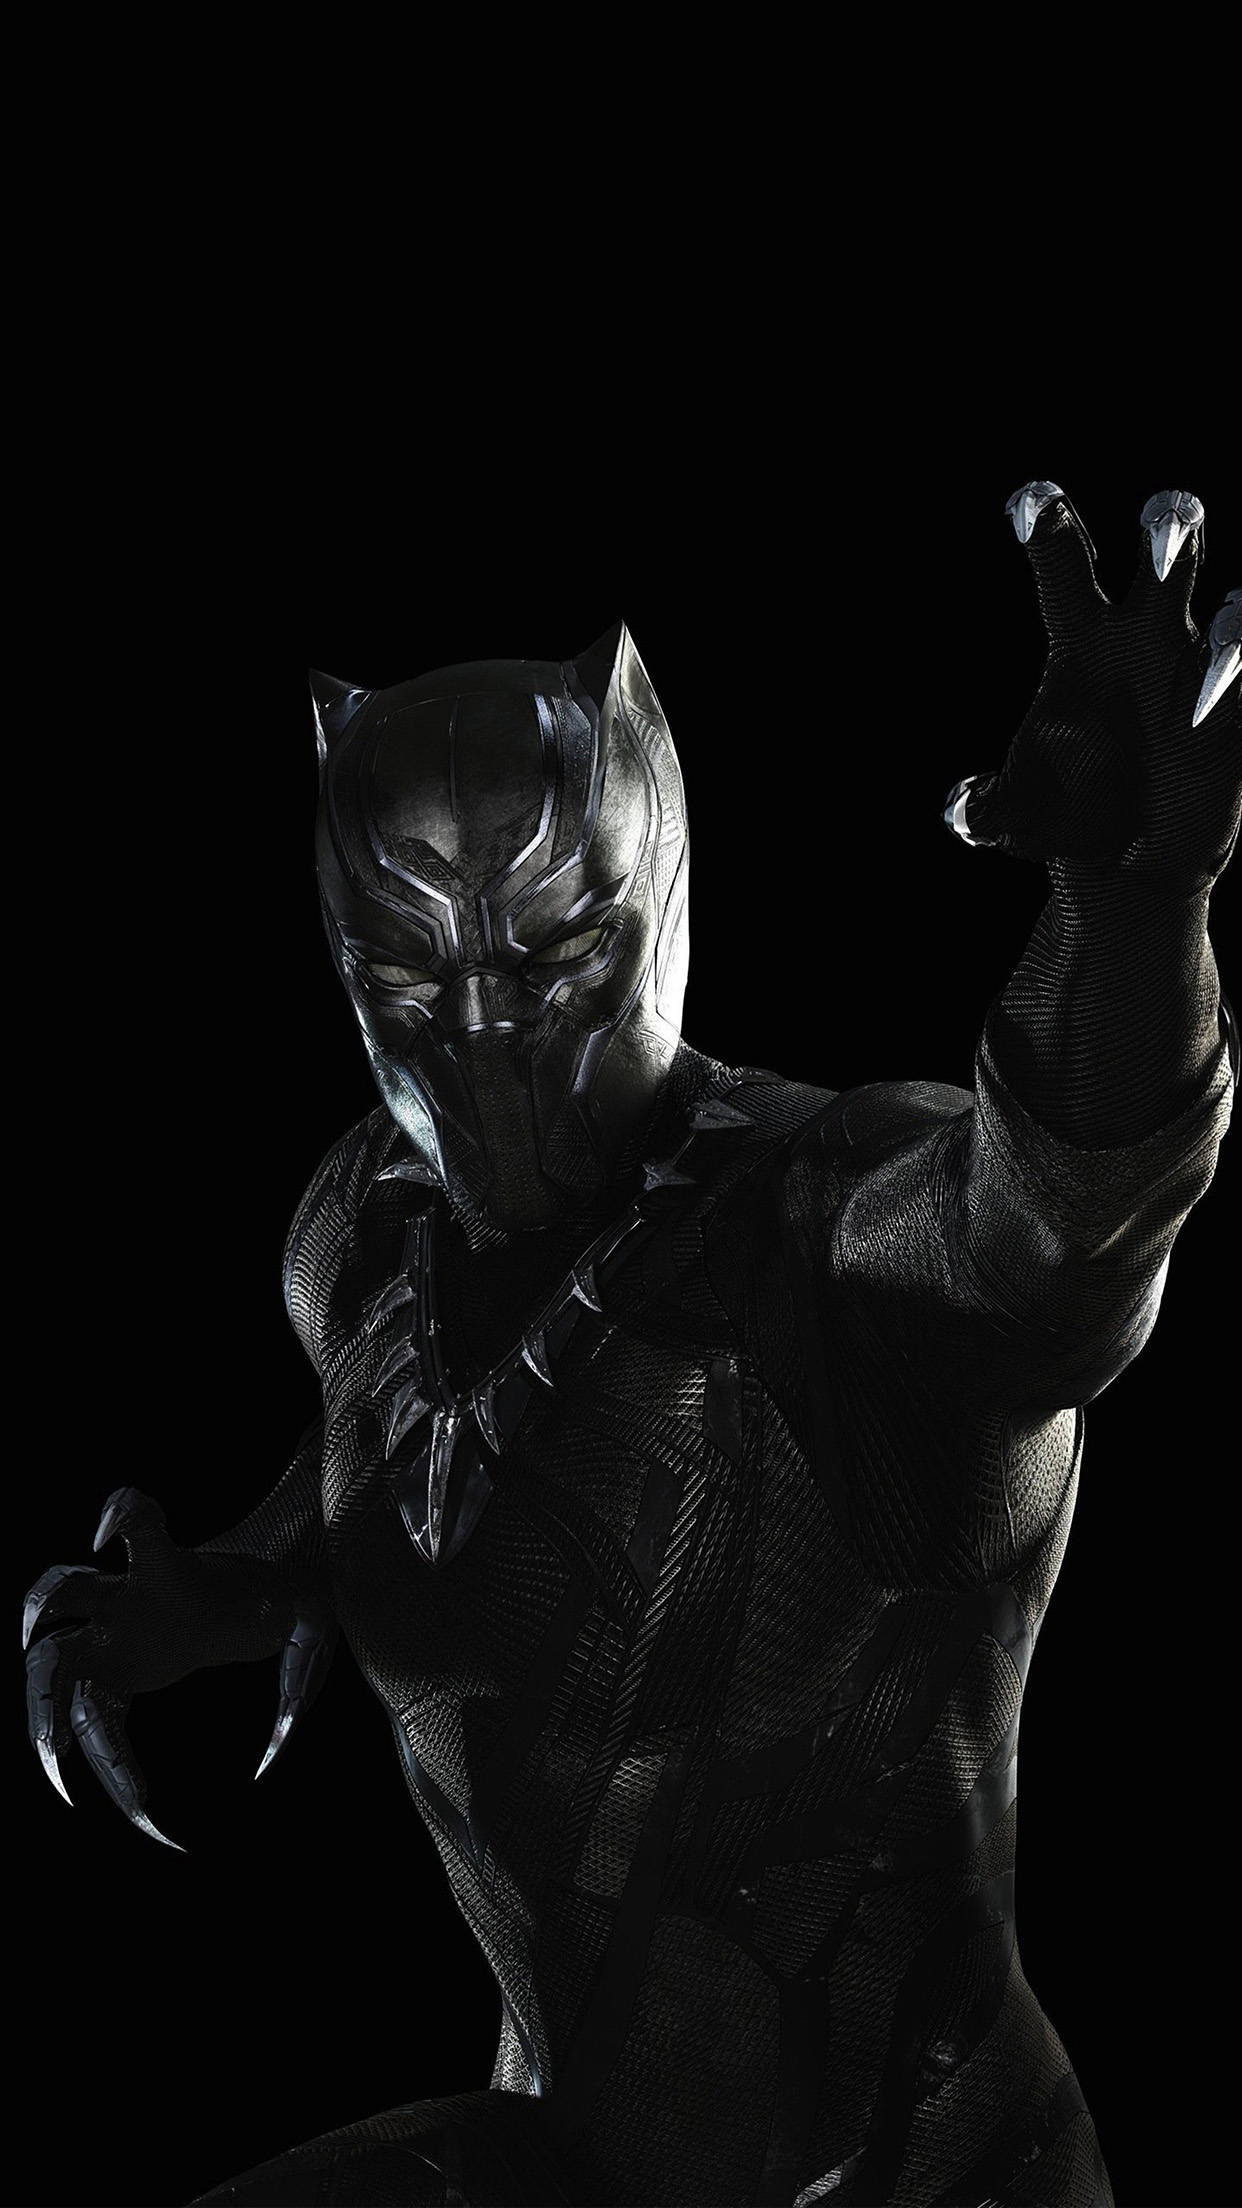 Papers Co Iphone Wallpaper Bd89 Black Panther Marvel Hero Art Illustration Dark